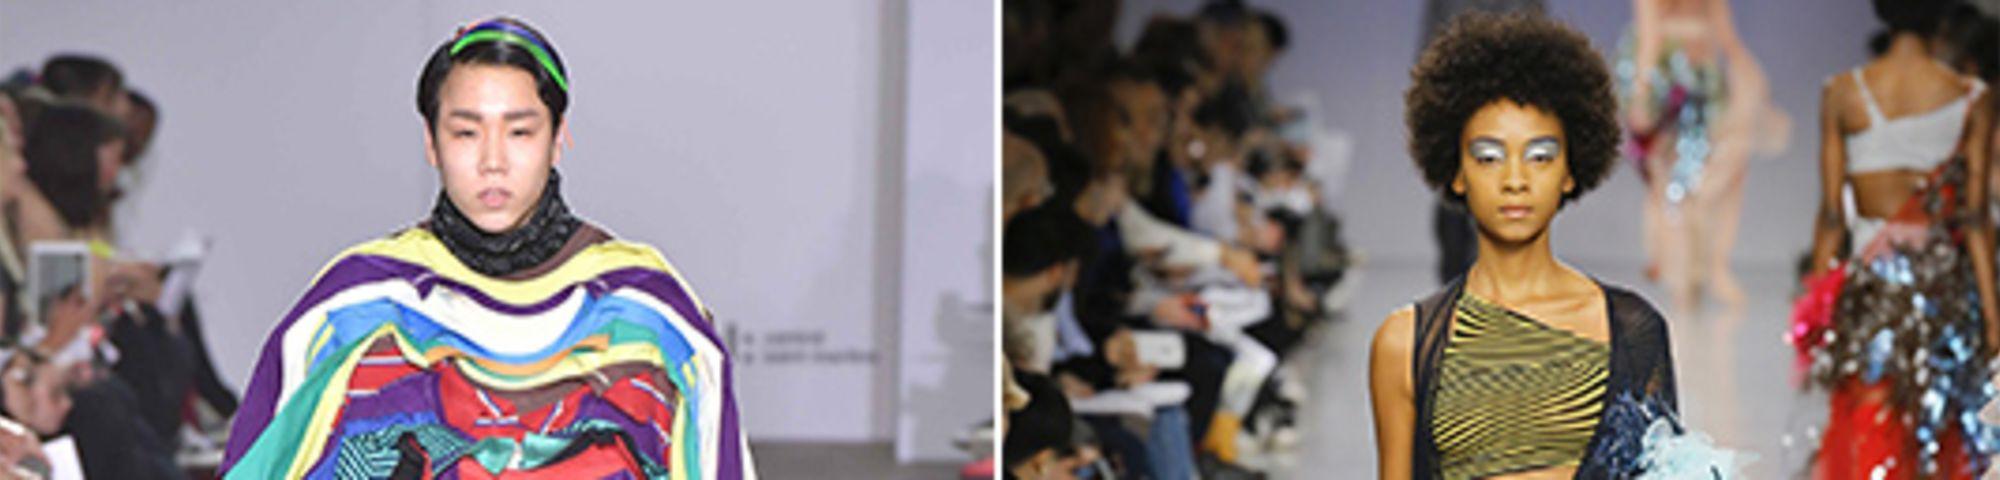 Untitled-Left, Goom Heo, BA Fashion 2017, and right, Gabriella Sardena, MA Fashion 20171